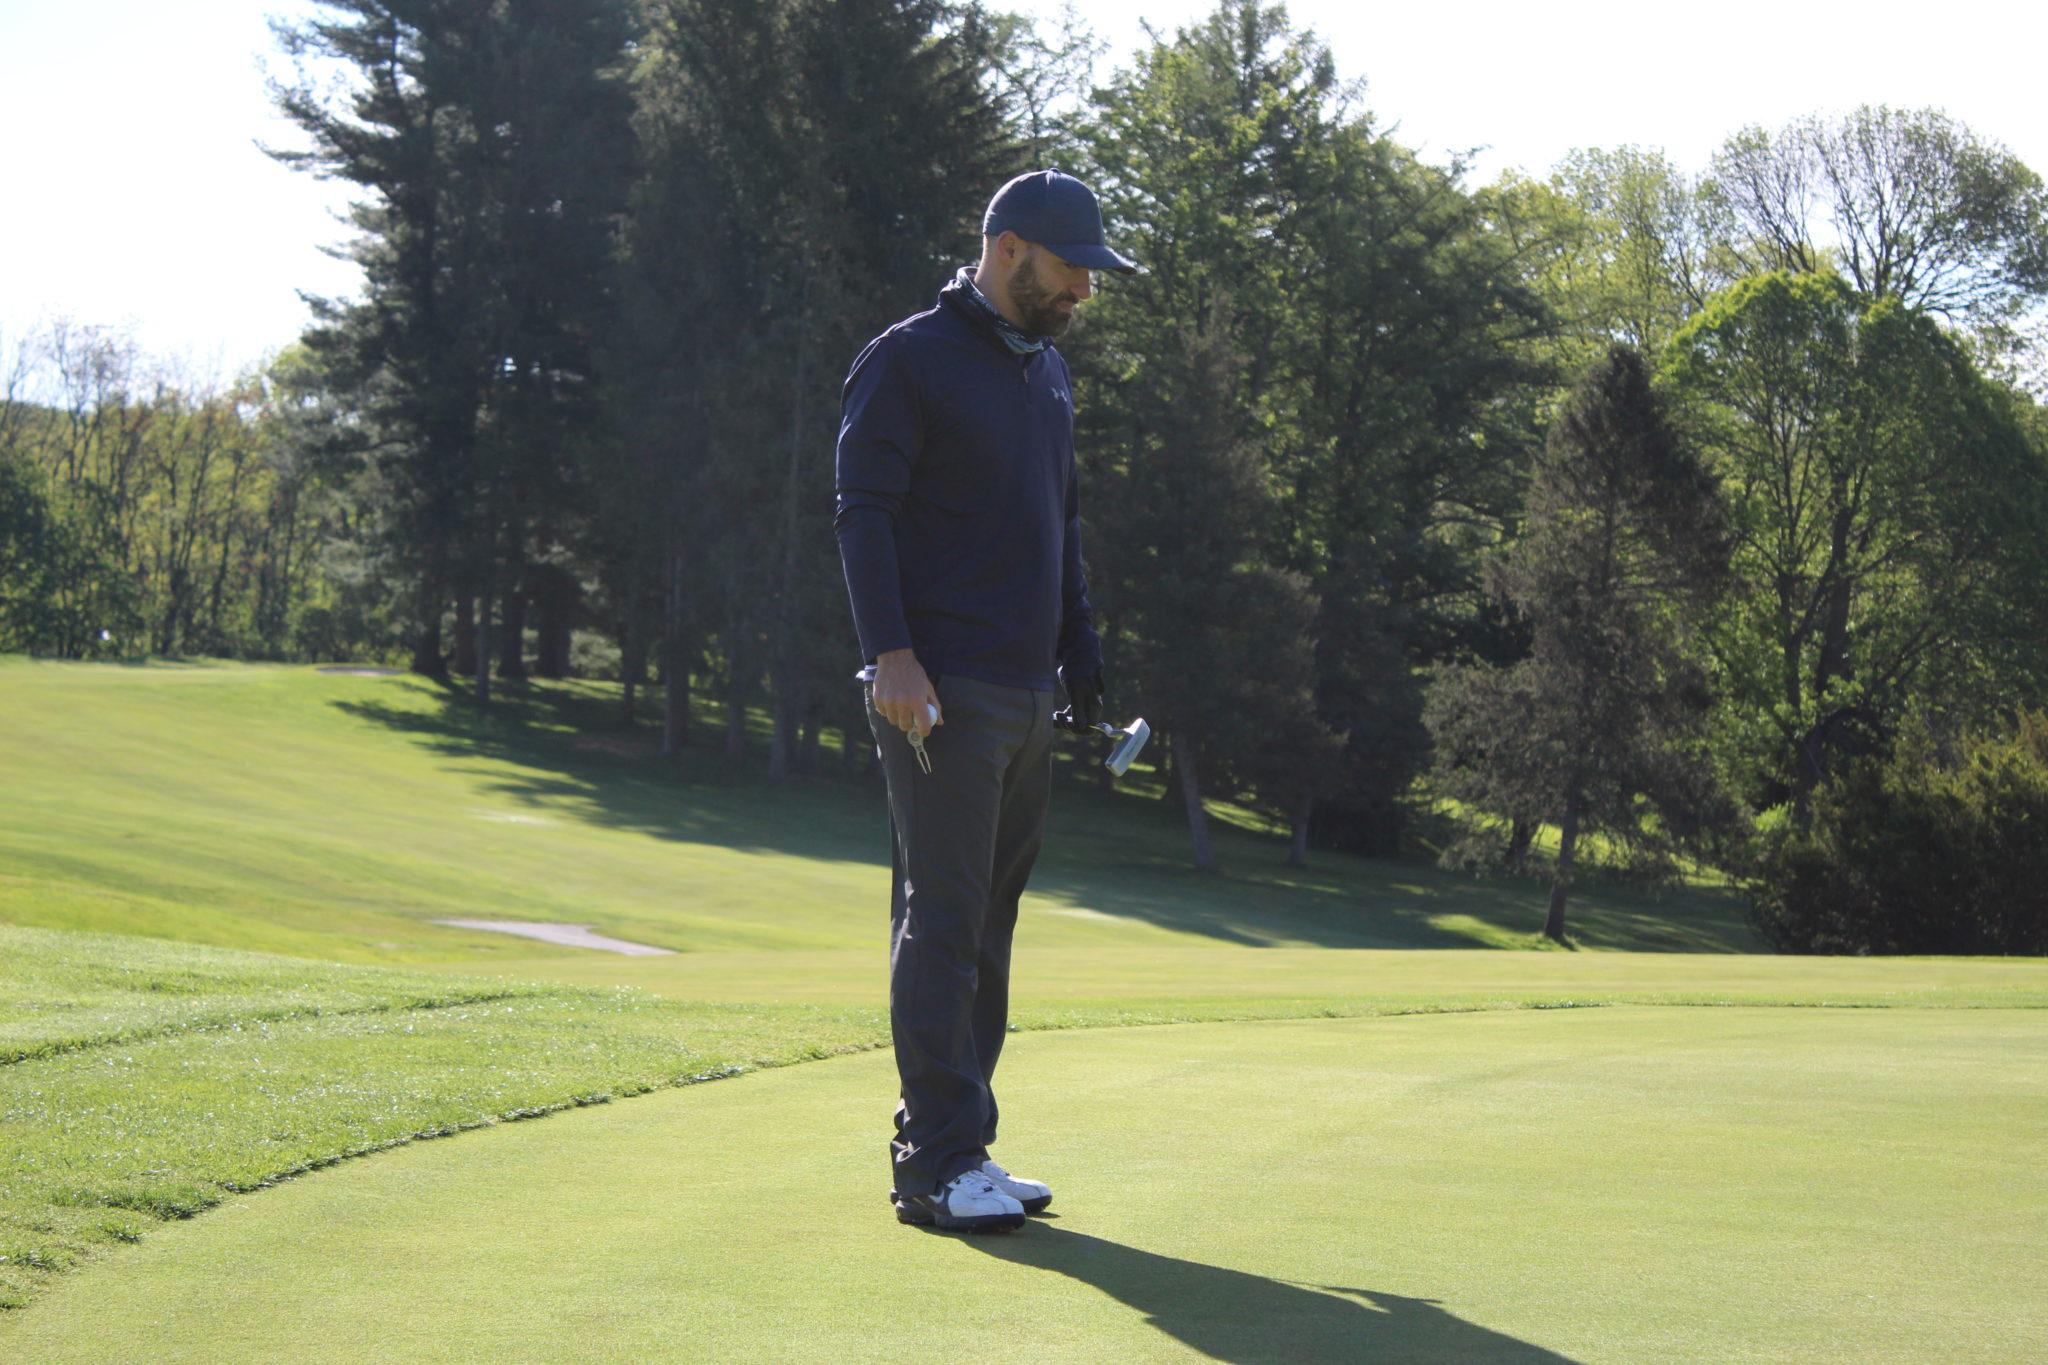 male golfer on green